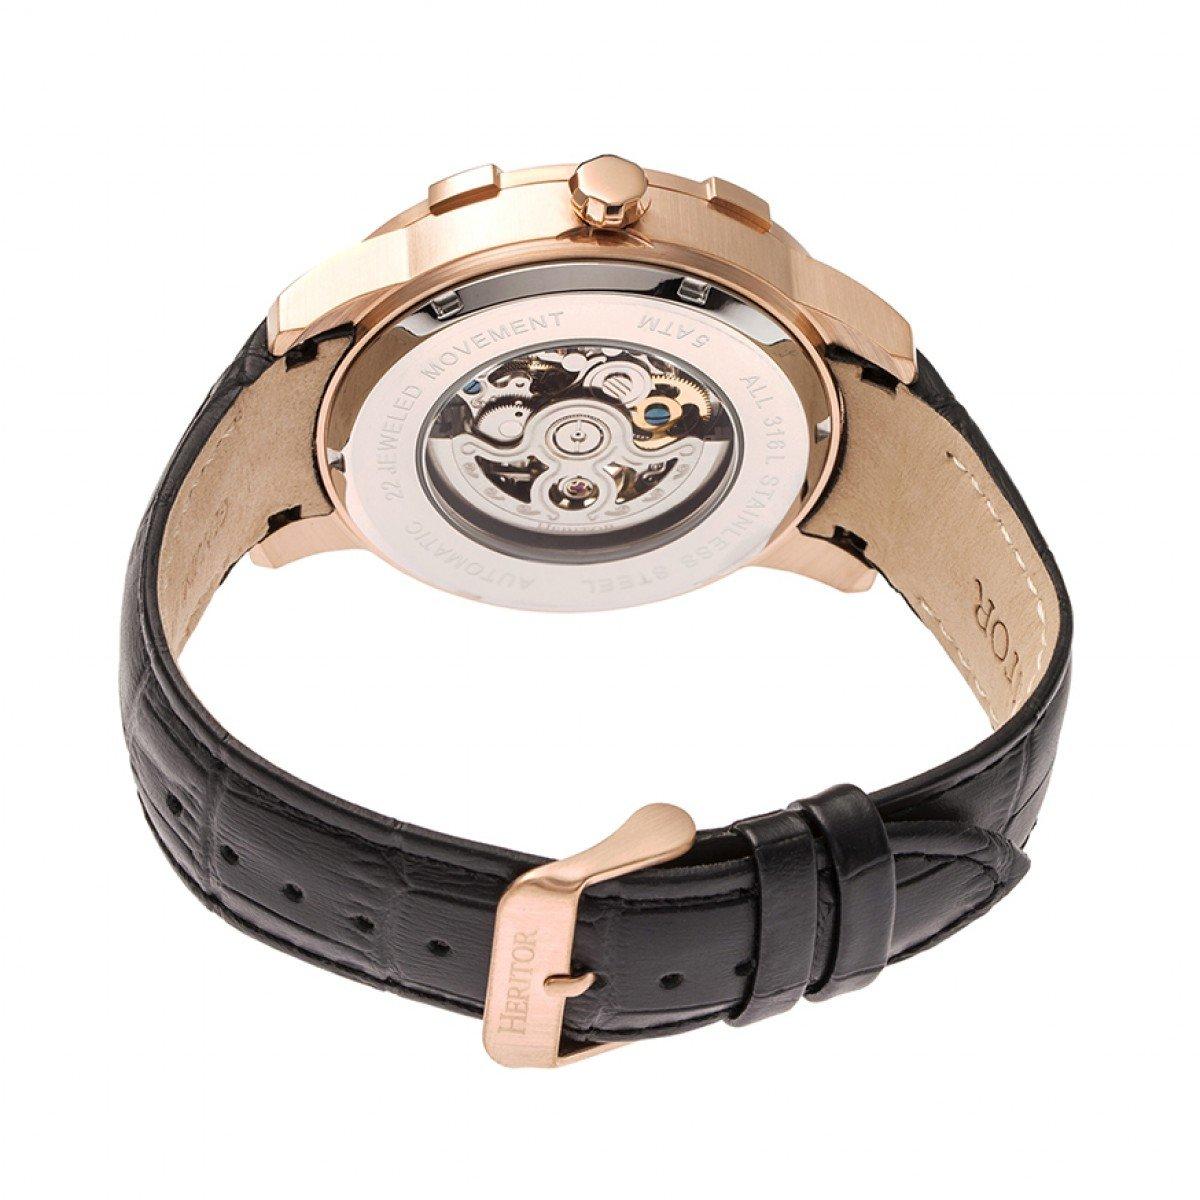 Heritor Automatic hr7205 Callisto reloj para hombre: heritor automatic: Amazon.es: Relojes